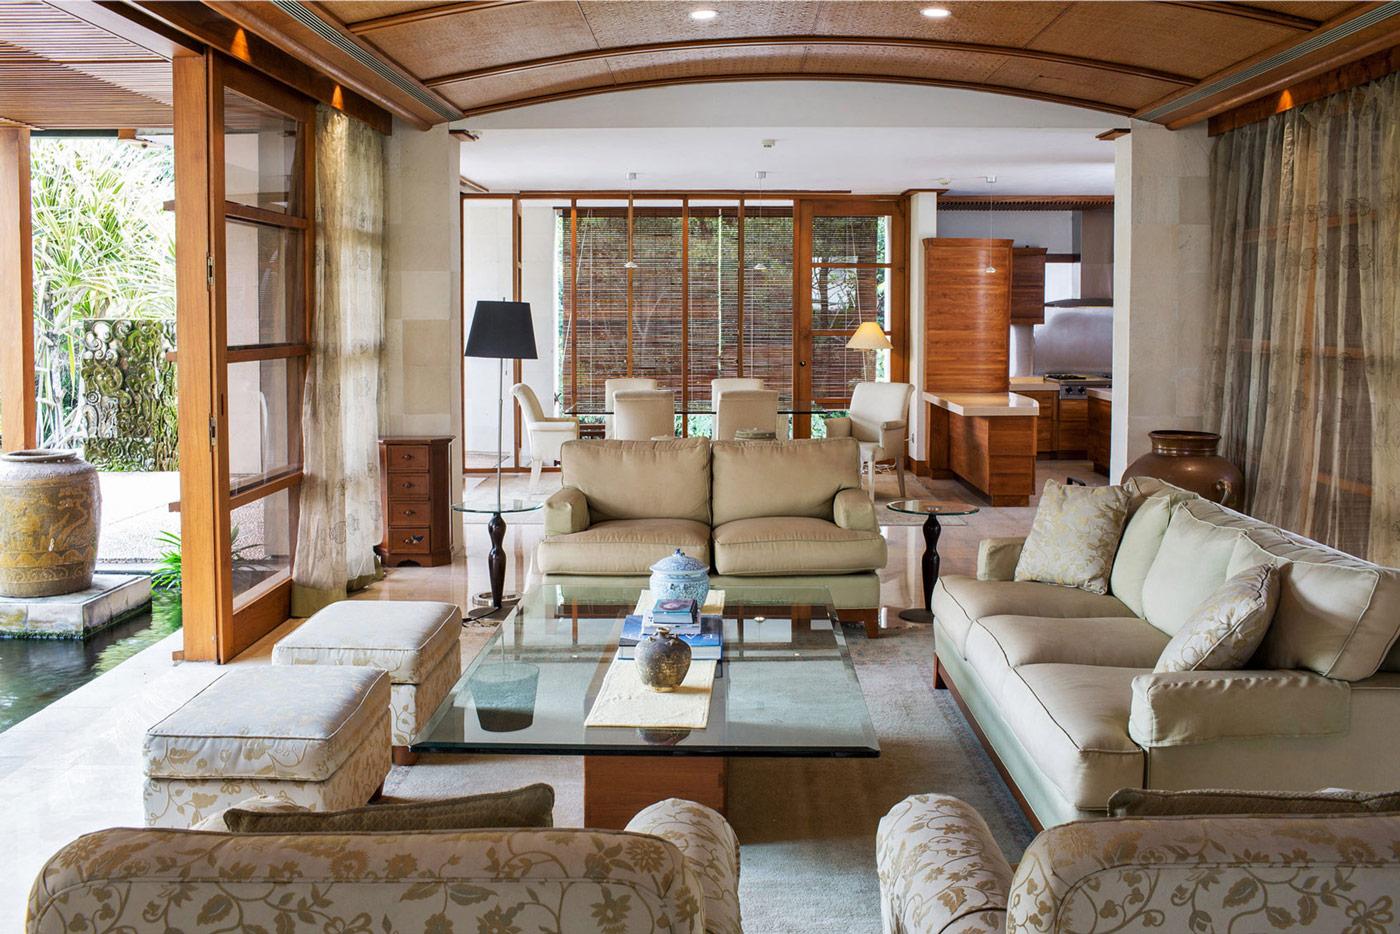 Living Room, Sofas, Glass Coffee Table, Home in Kuala Lumpur, Malaysia